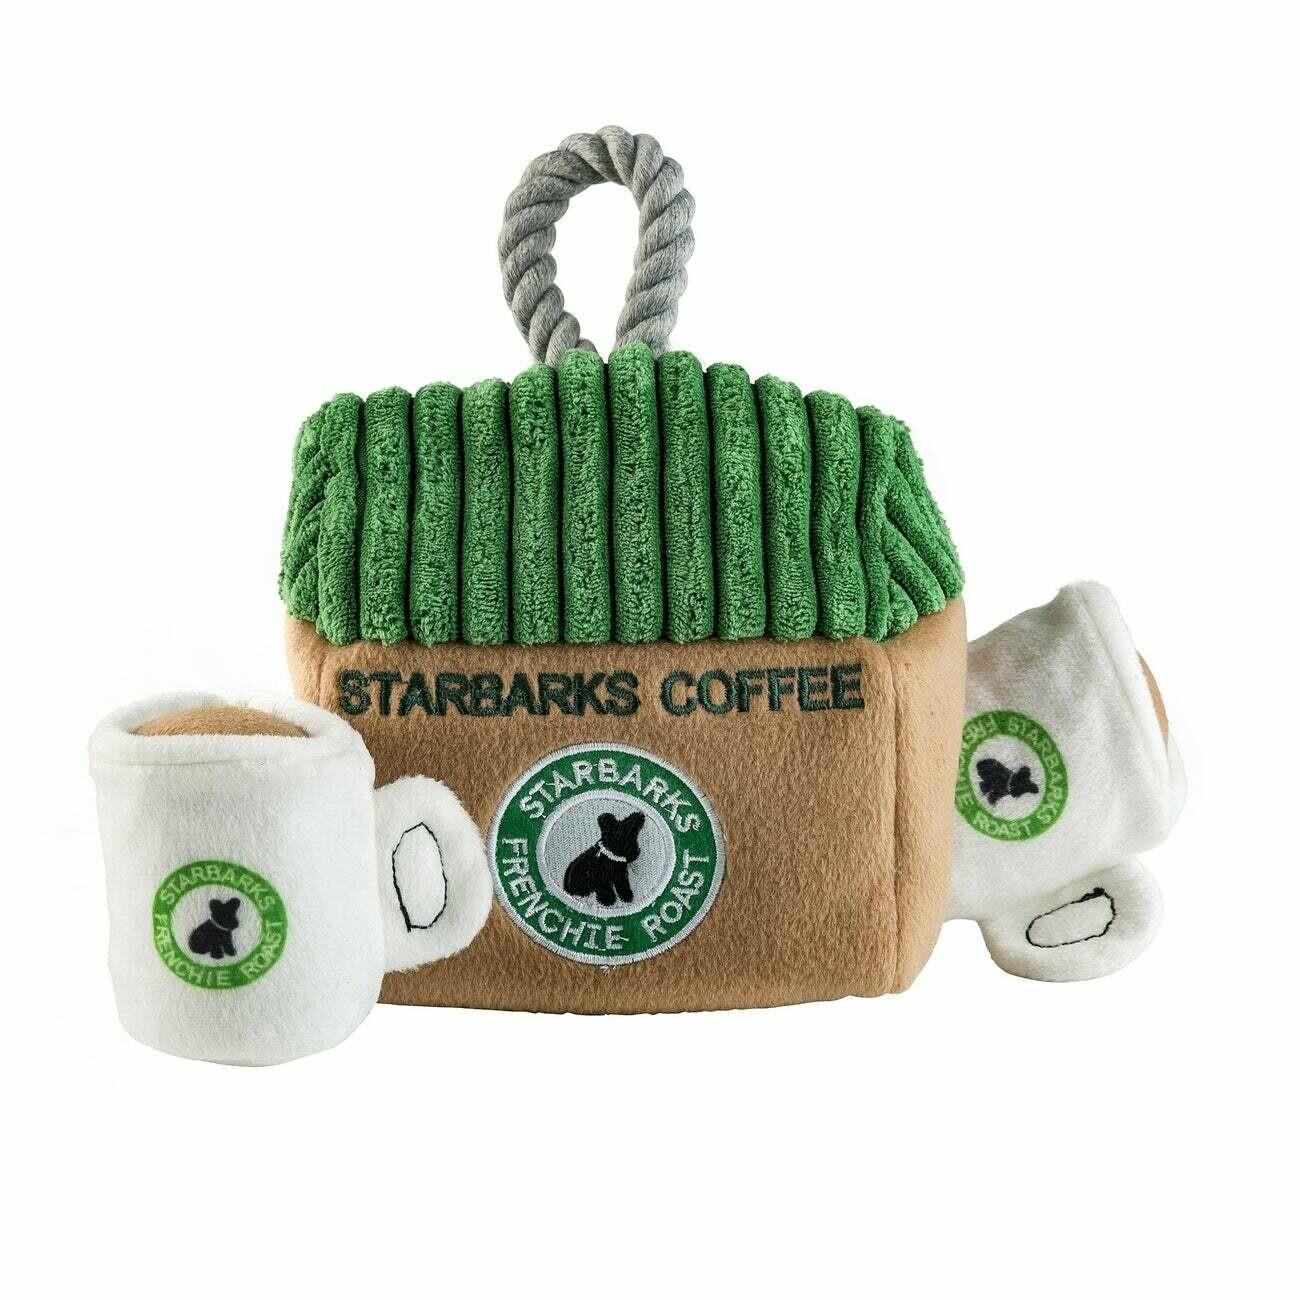 Starbarks Cafe Hide & Seek Toy